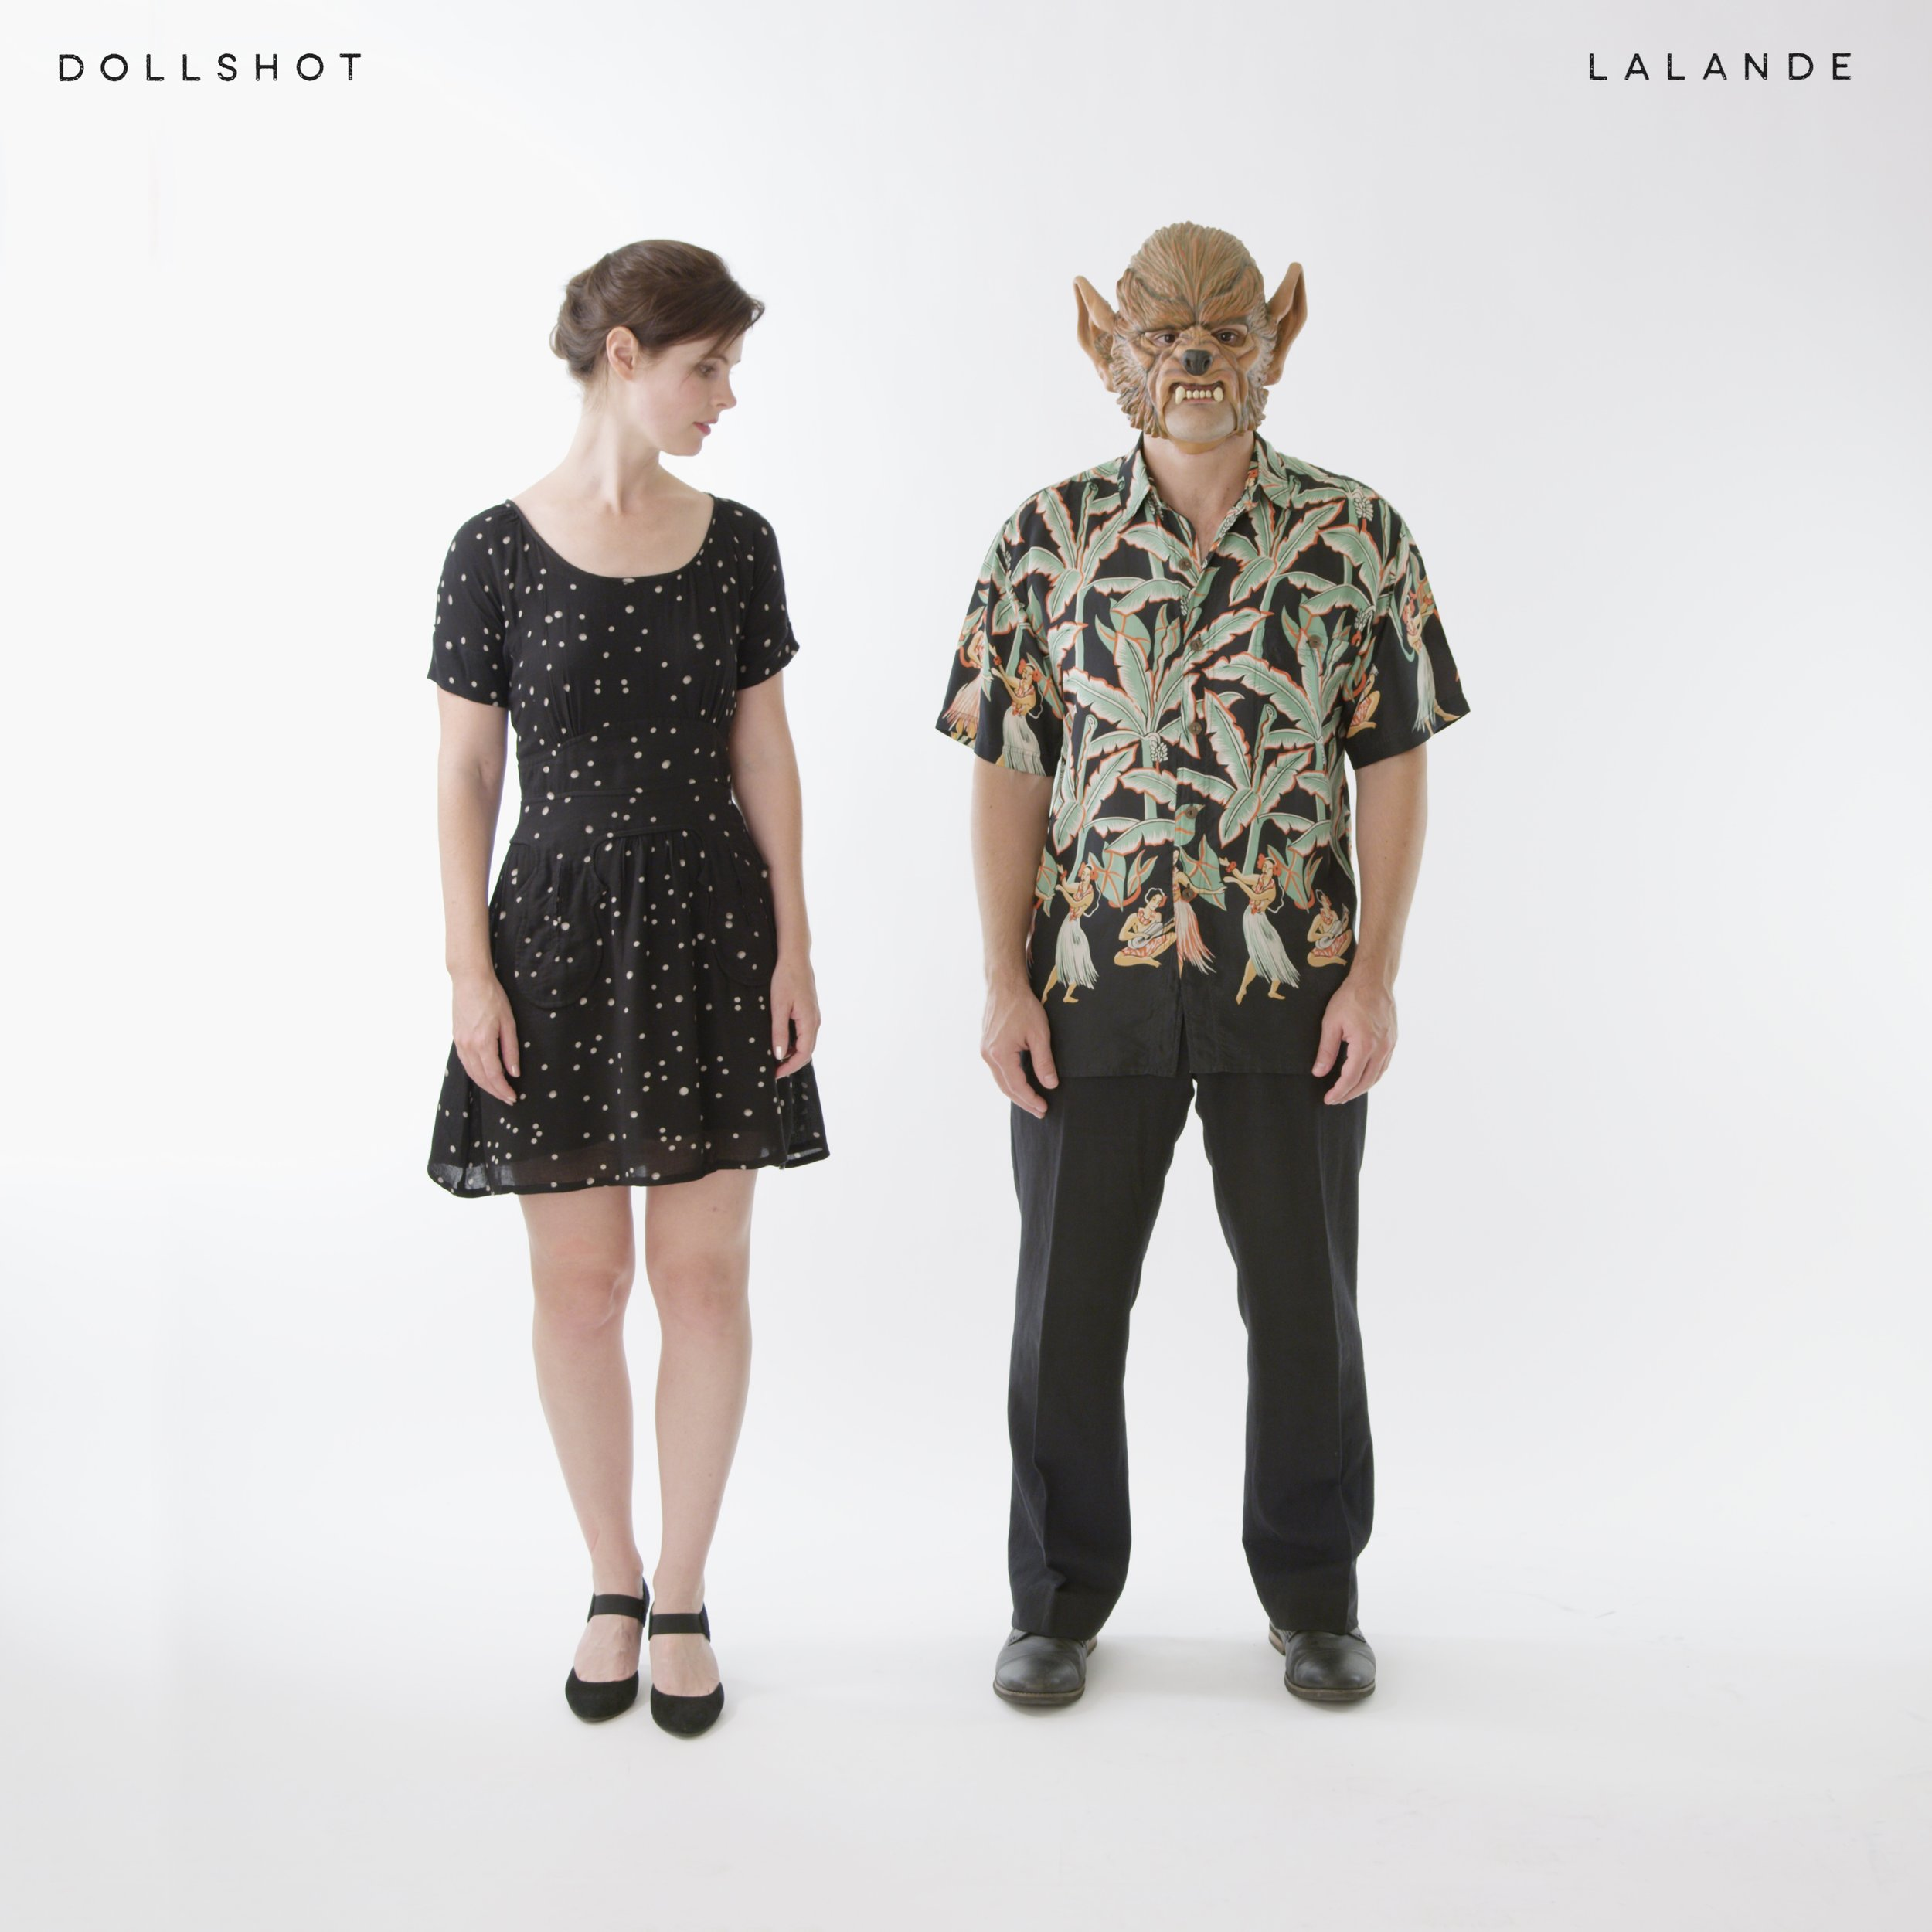 Lalande_Dollshot